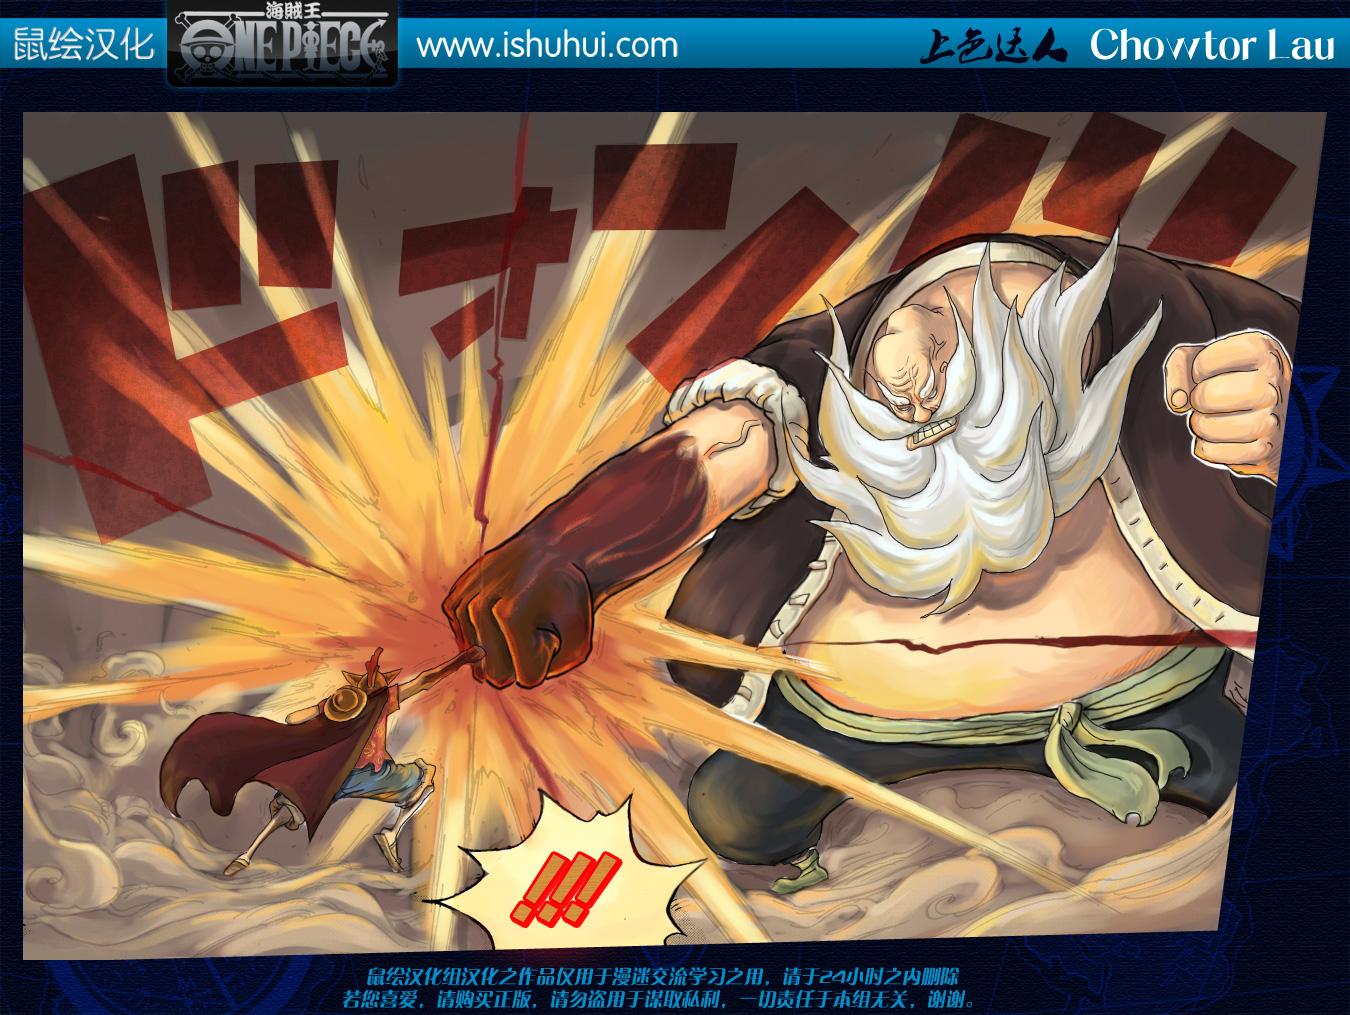 018 One Piece 716   ชินเจา